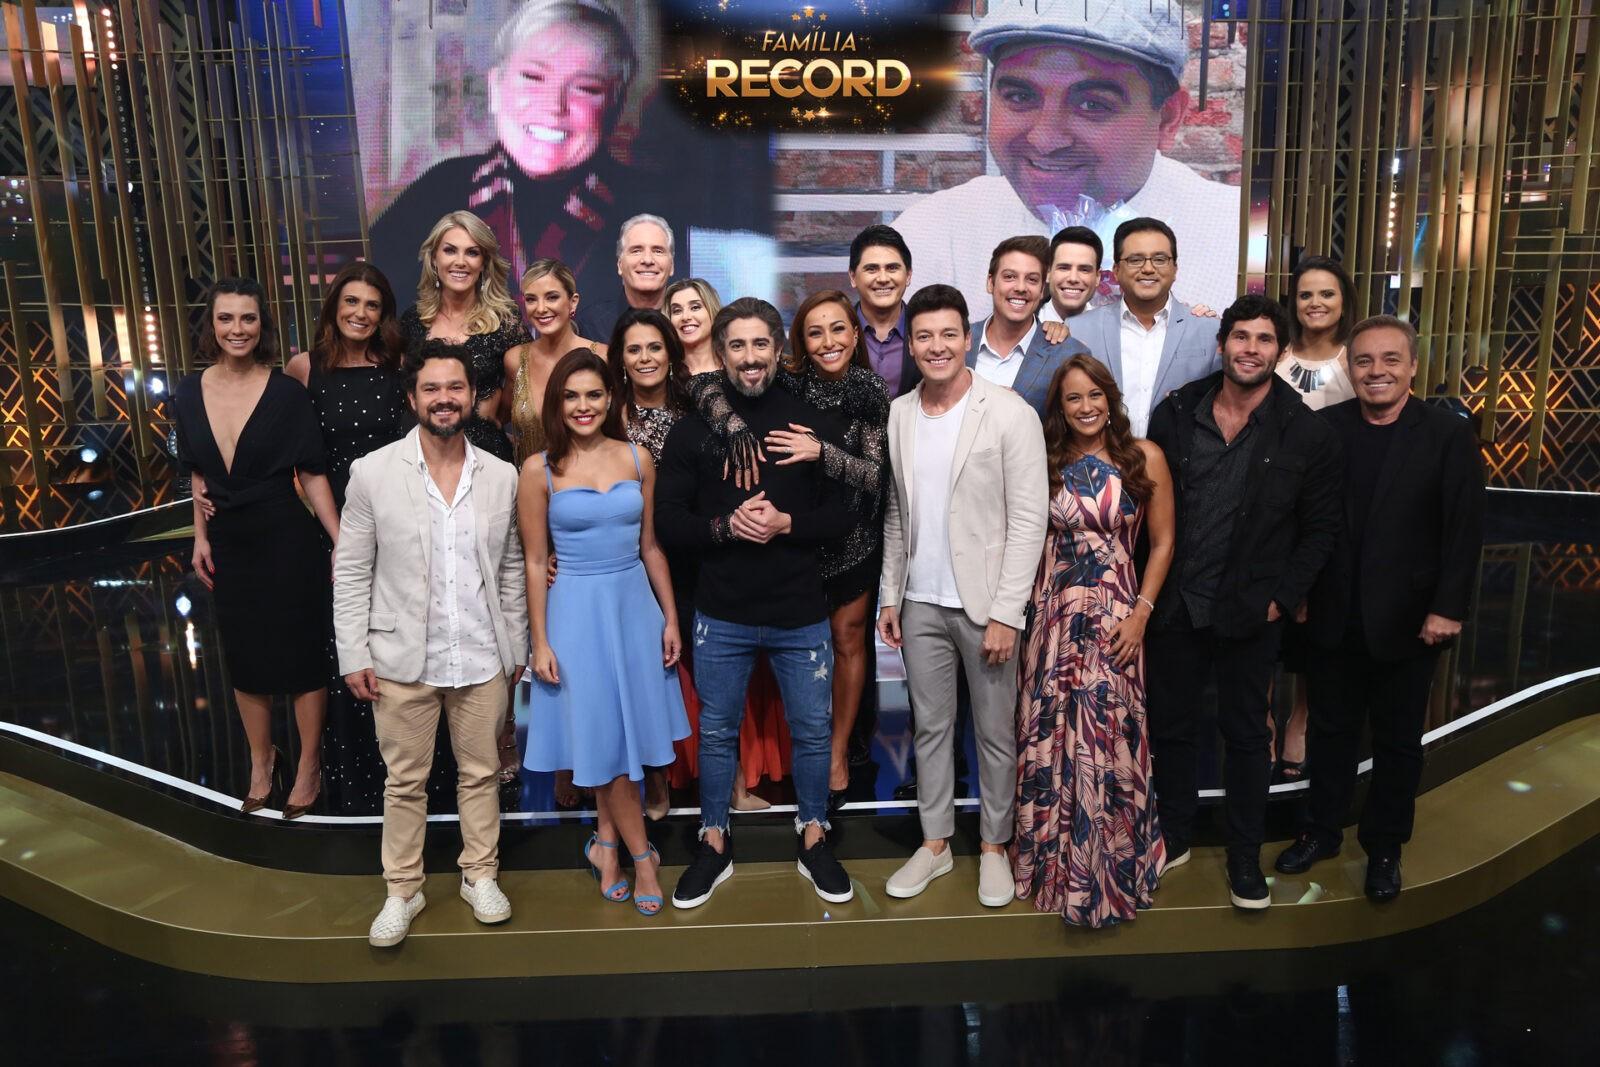 Família Record 2017 (CRÉDITO DAS FOTOS: ANTÔNIO CHAHESTIAN)